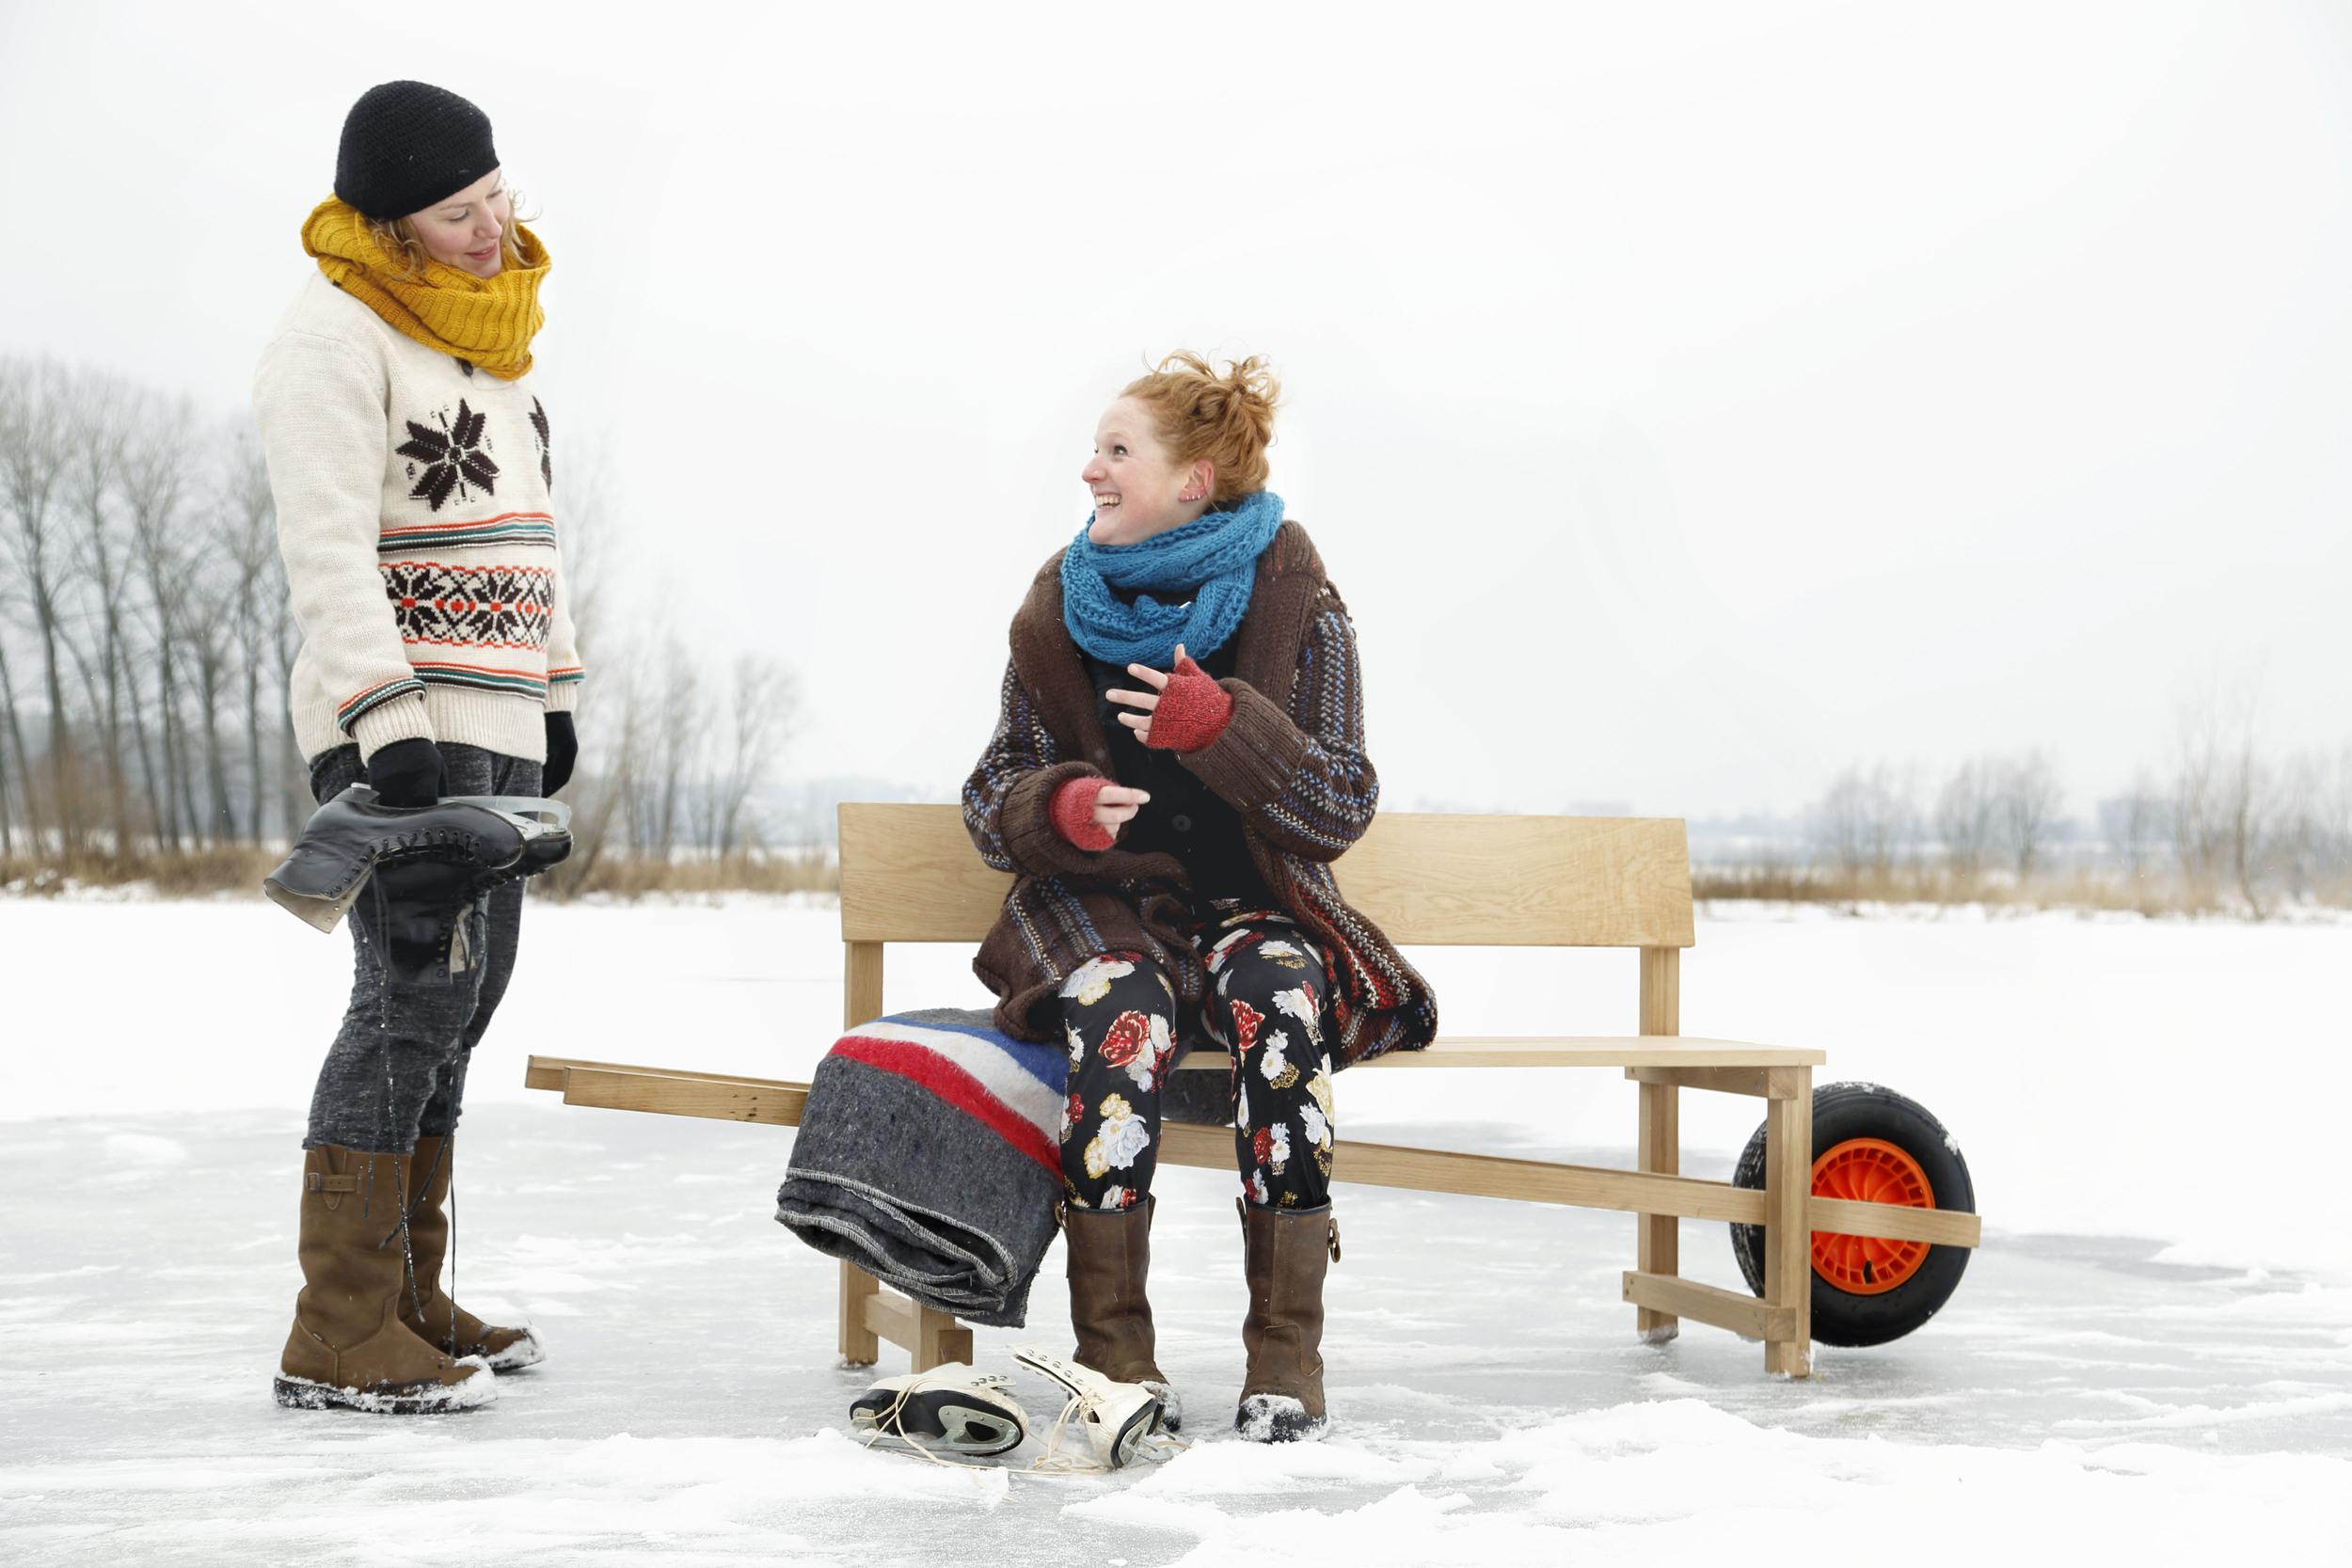 wheelbench-winter-kletsen-ws.jpg